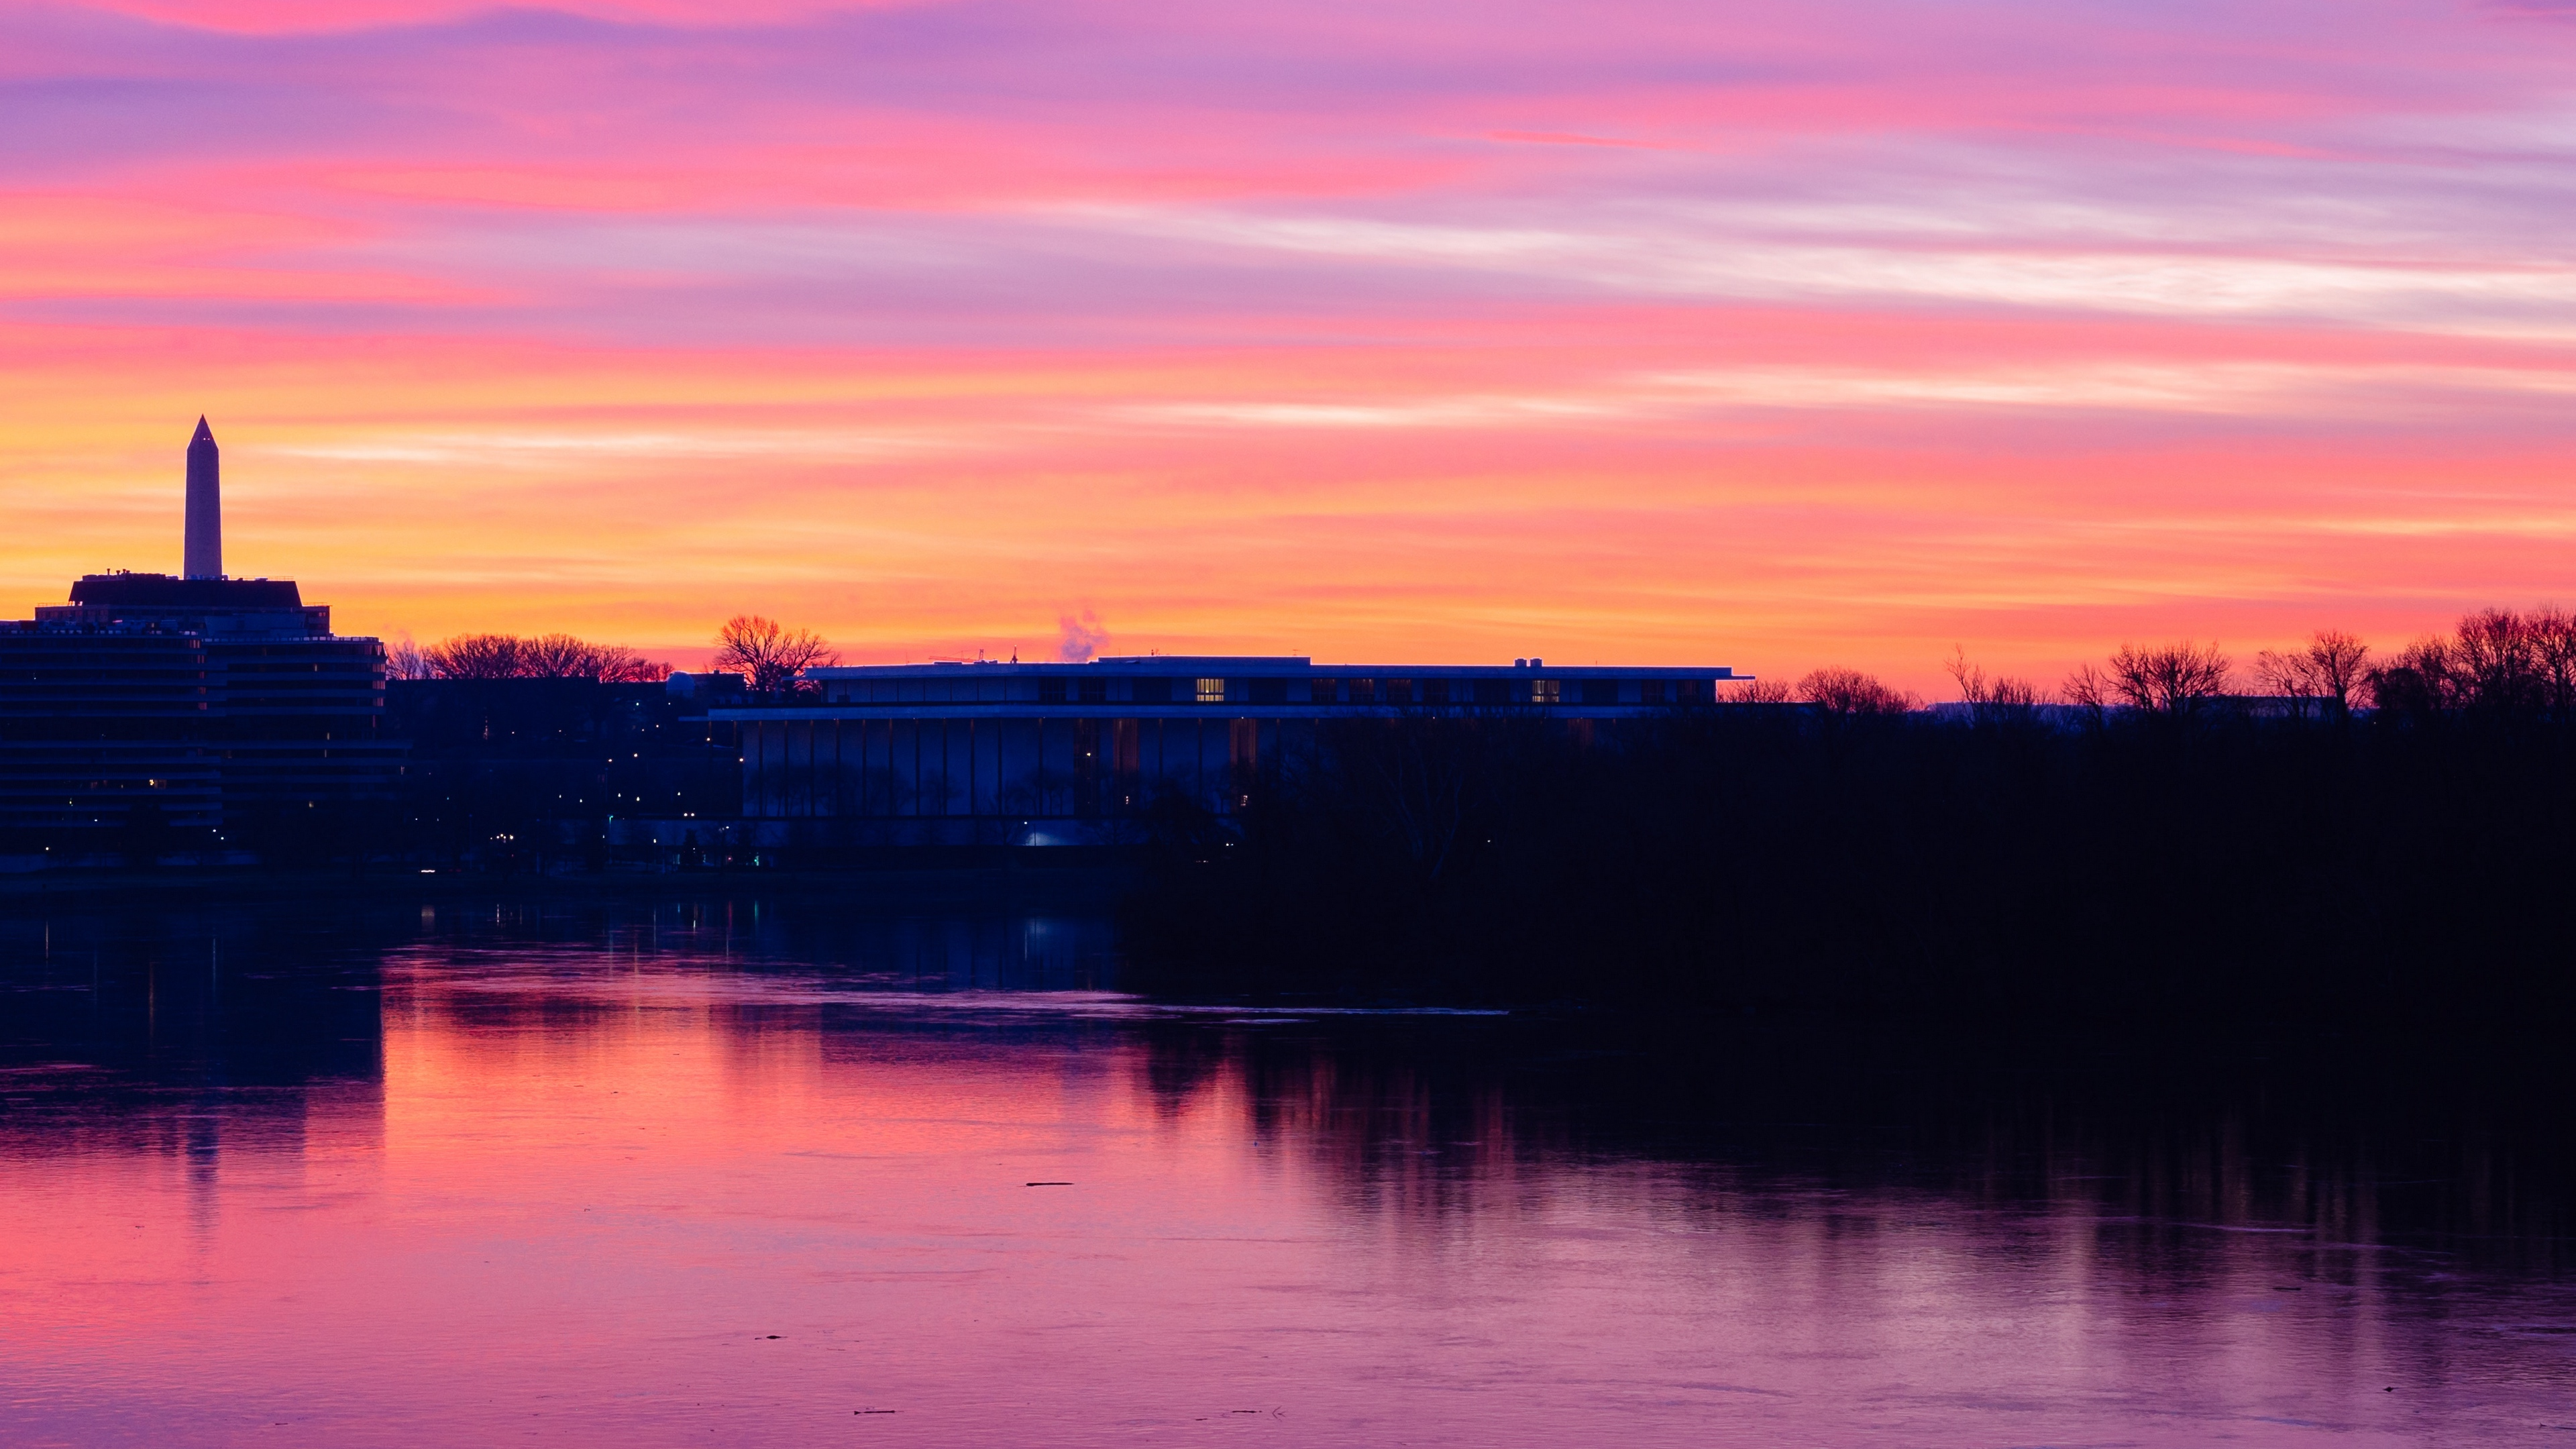 sunset river building sky 4k 1538065307 - sunset, river, building, sky 4k - sunset, River, Building